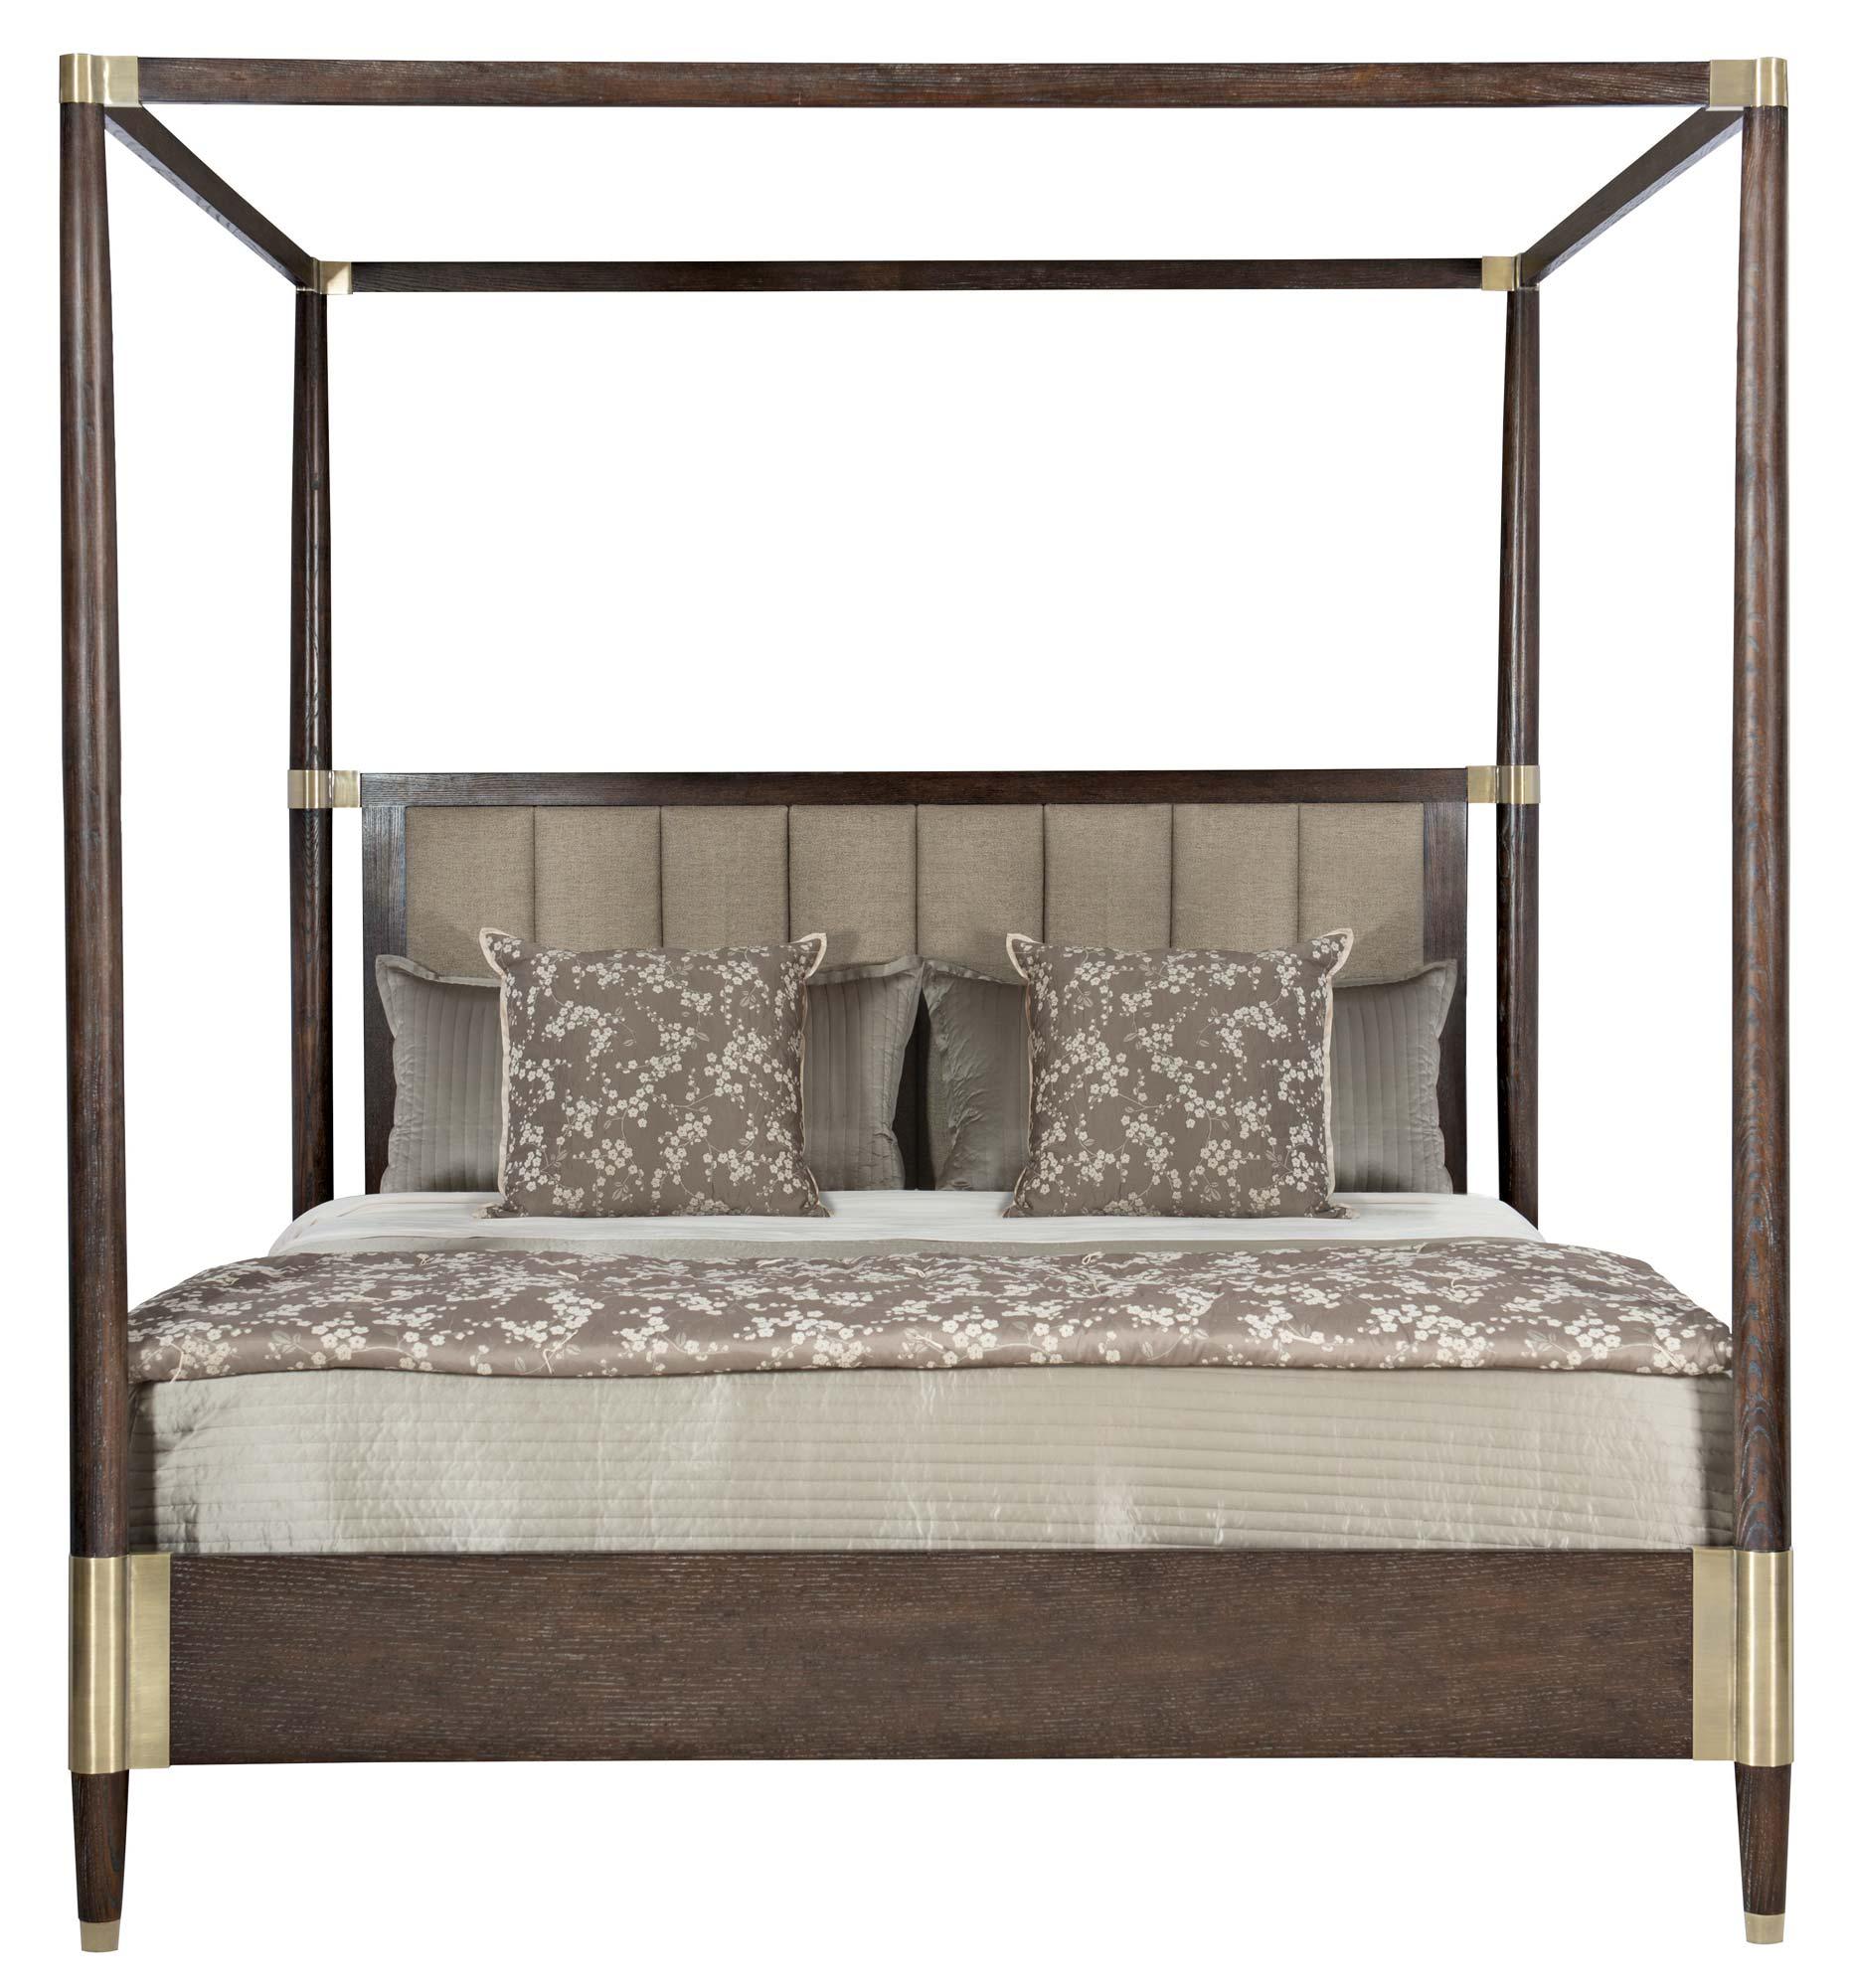 Bernhardt Claredon Canopy Bed